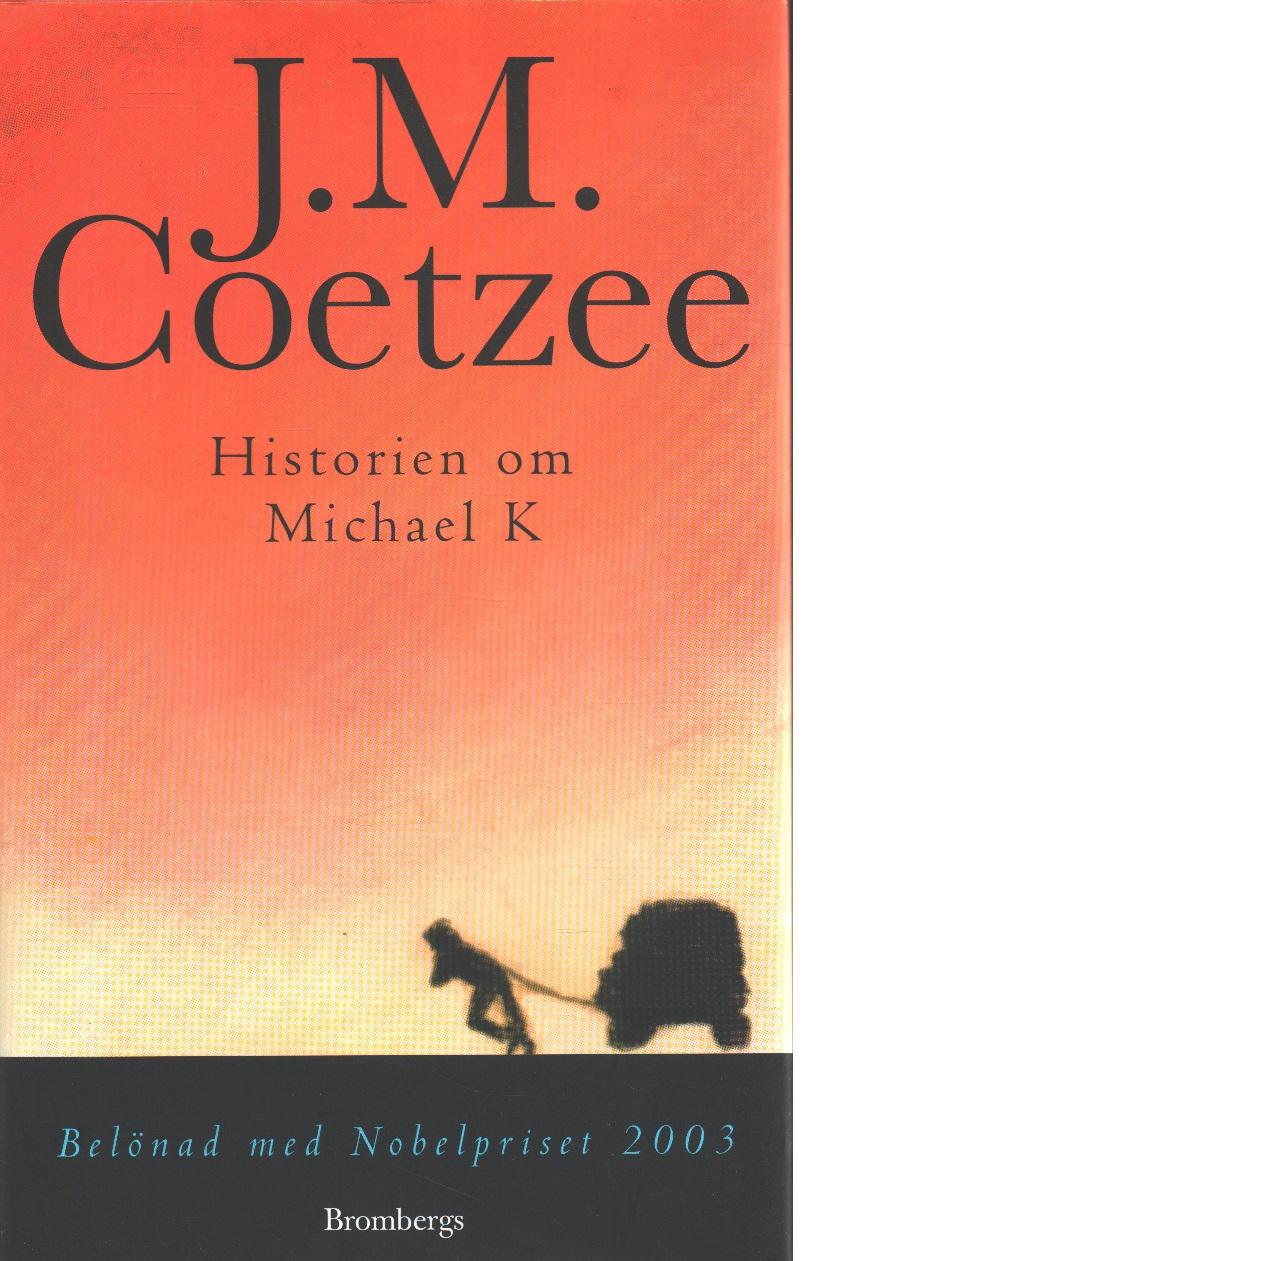 Historien om Michael K - Coetzee, J. M.